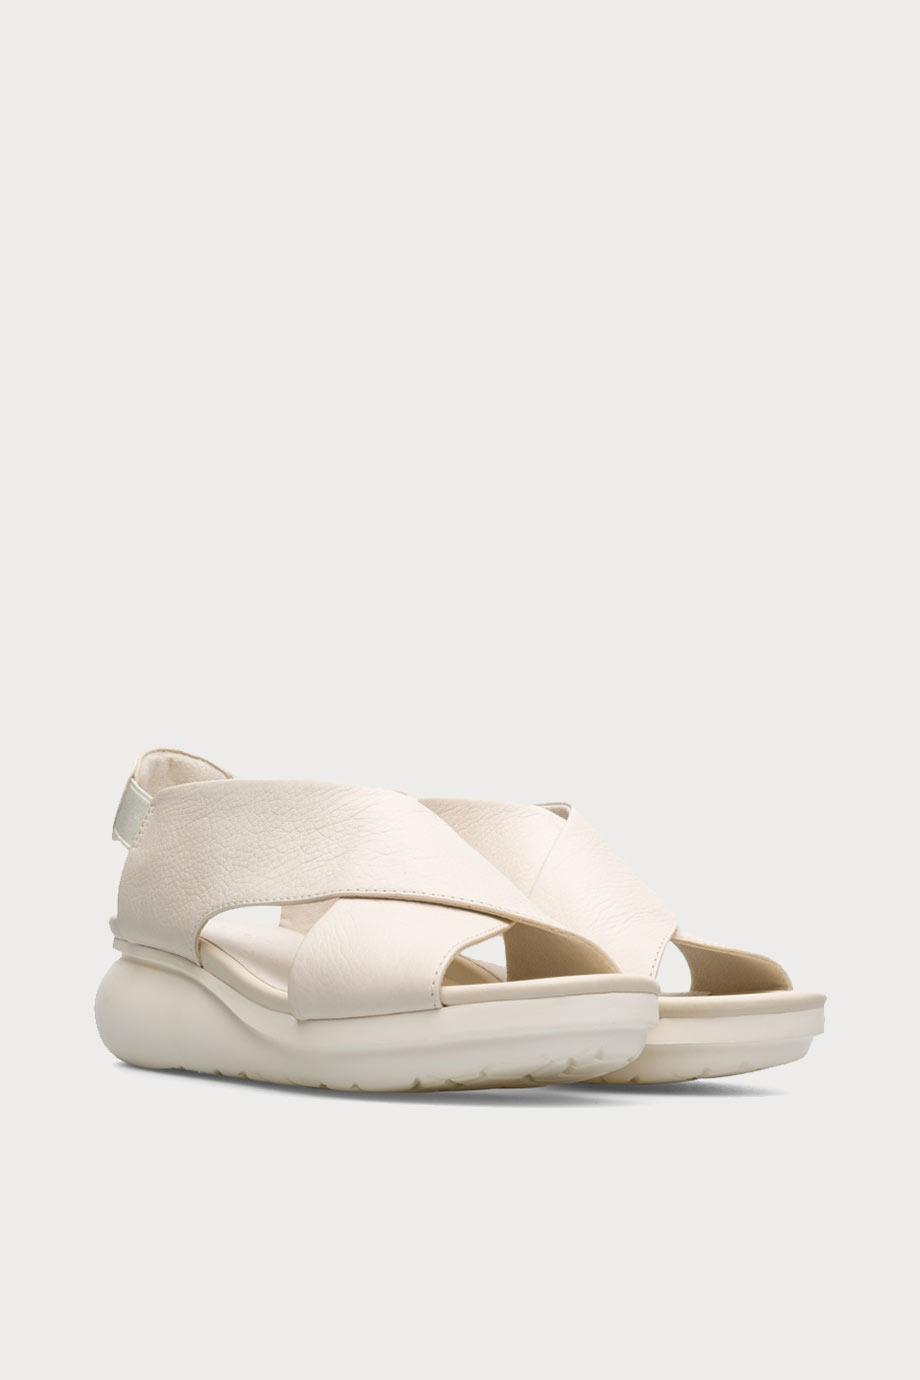 spiridoula metheniti shoes xalkida p k2000066 019 ballon white leather camper 2